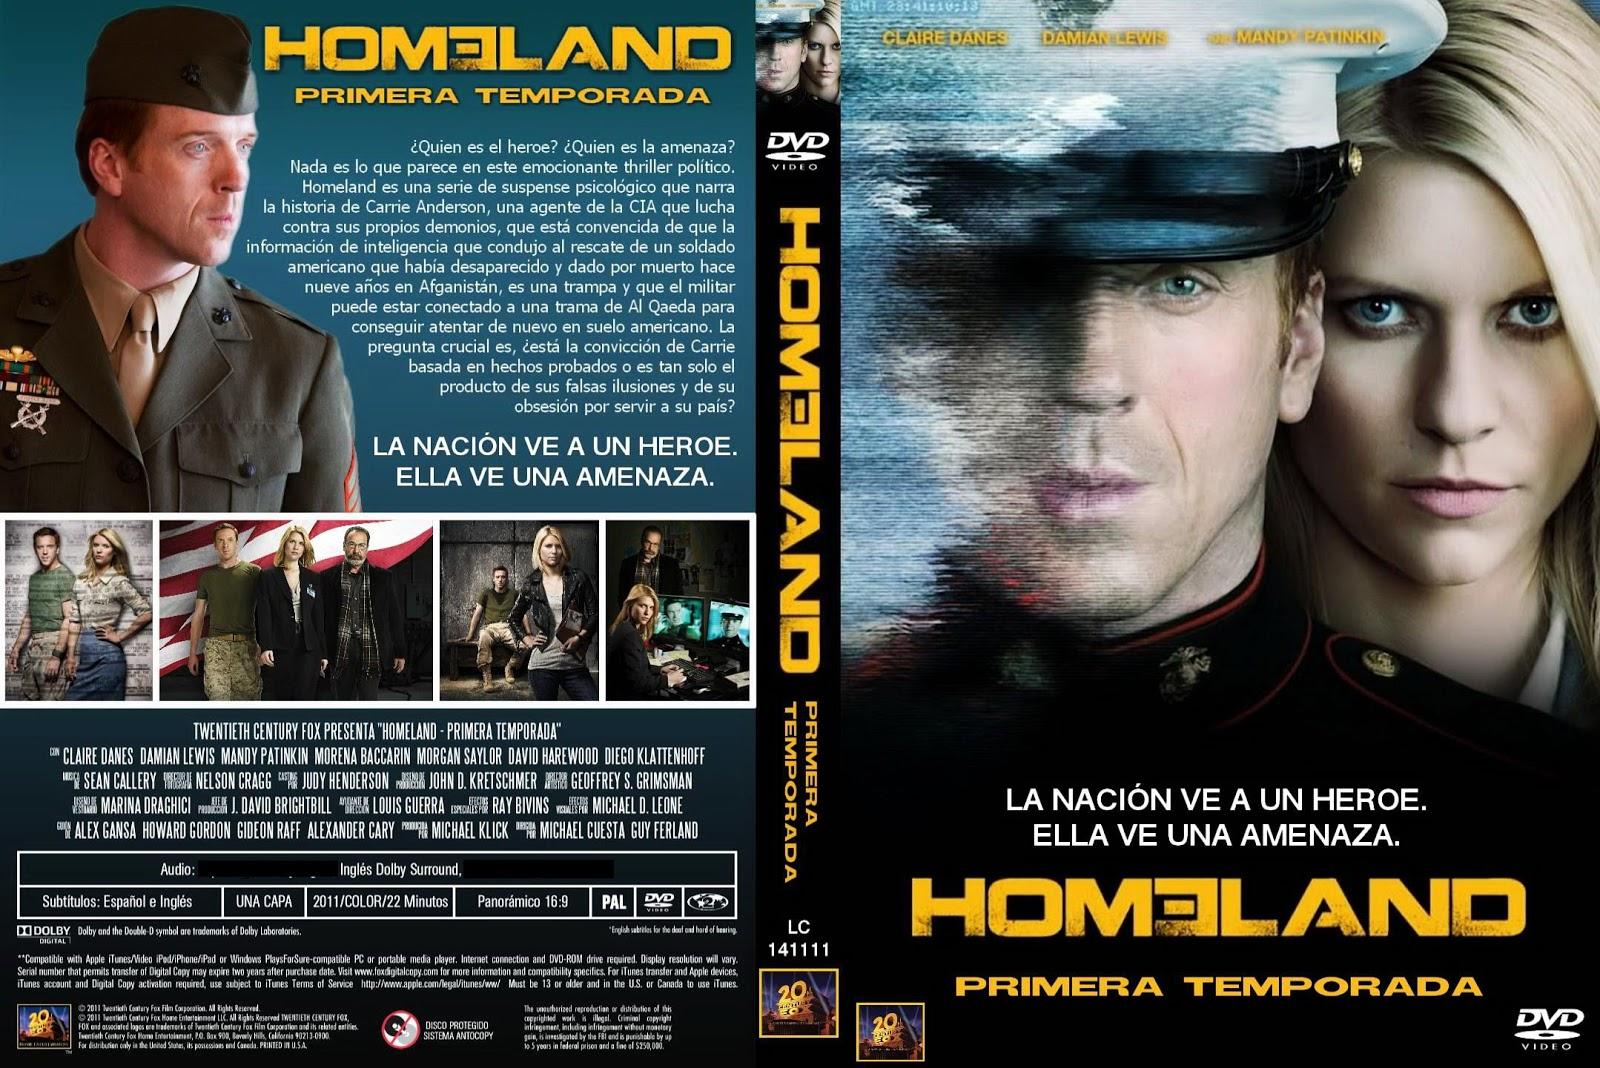 http://3.bp.blogspot.com/-_yh8e8nYkcA/UKlMWEqZovI/AAAAAAAAD0o/CCUSdYIKnGw/s1600/Homeland+Temporada+01+-+2011.jpg